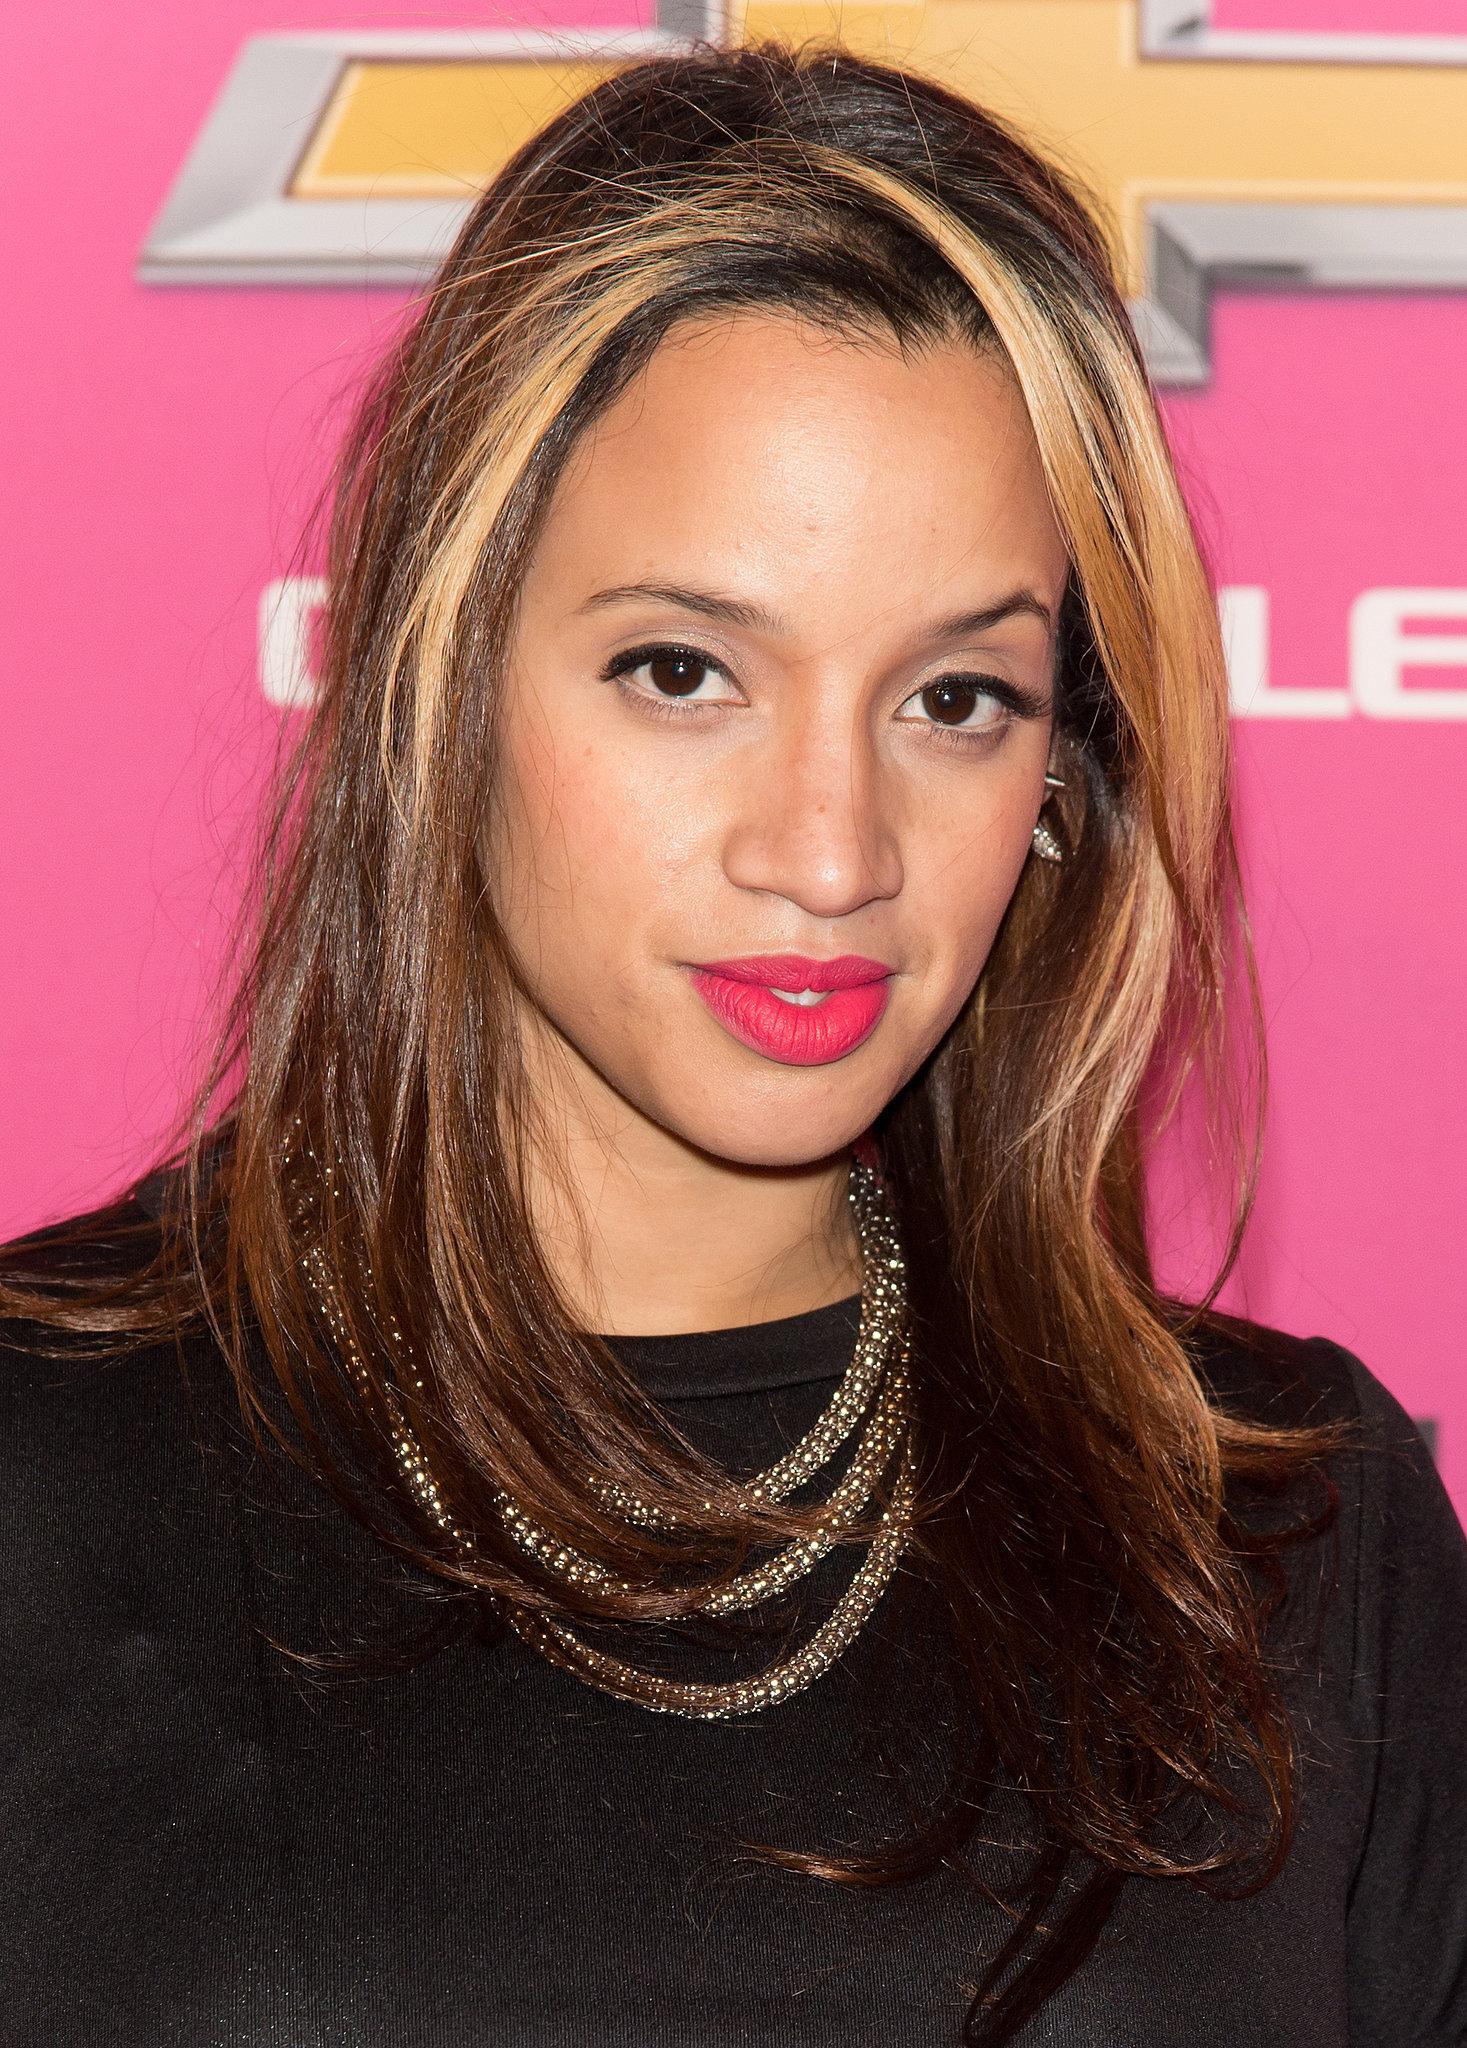 Orange Is the New Black star Dascha Polanco showed off a pop of magenta across her lips.